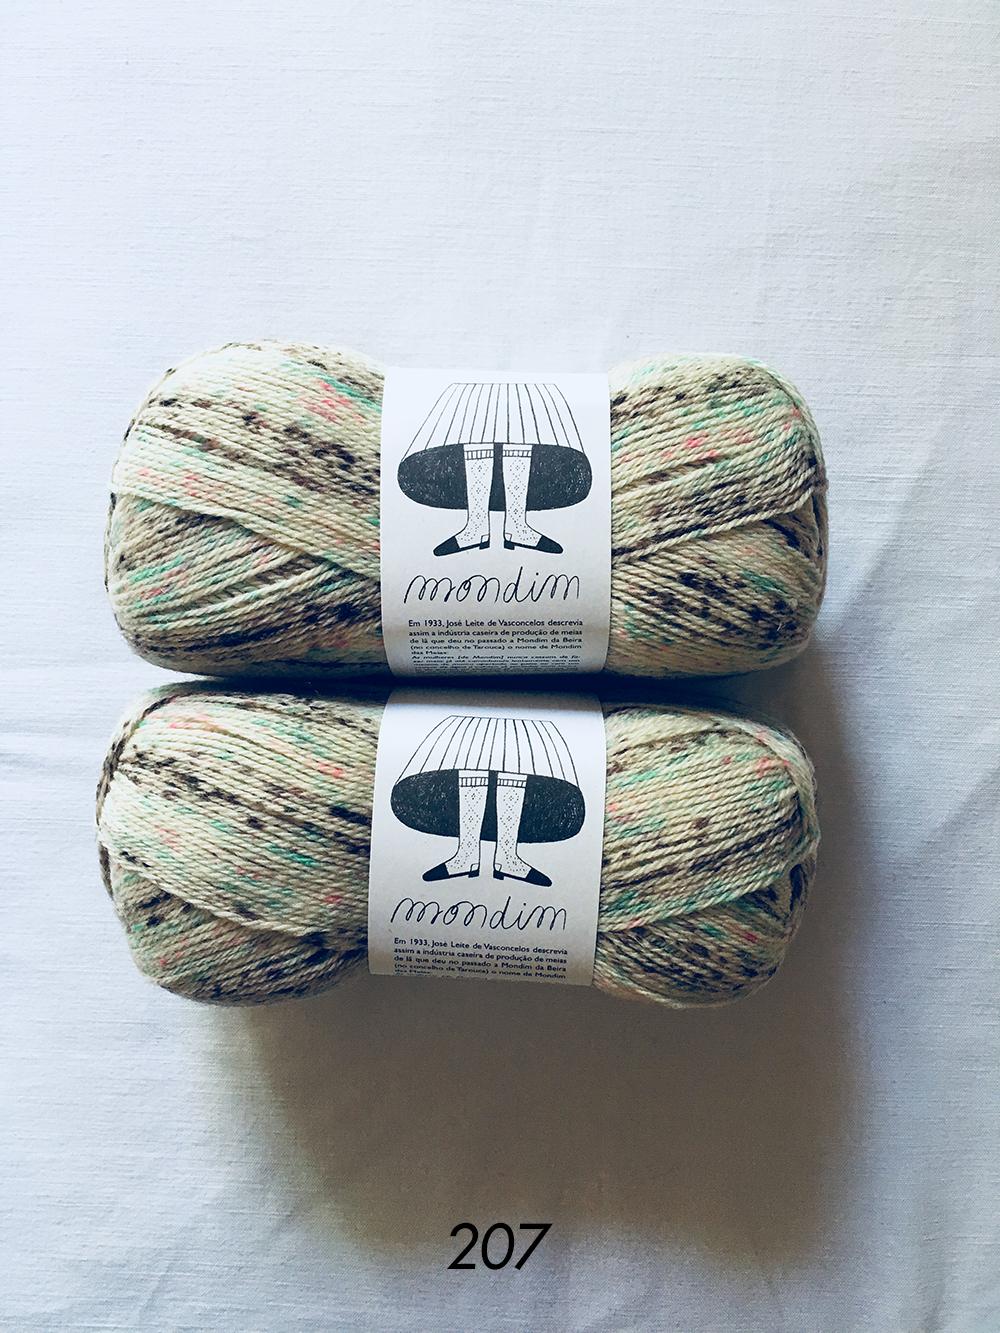 retrosaria_mondim_207_wool_done_knitting.jpg